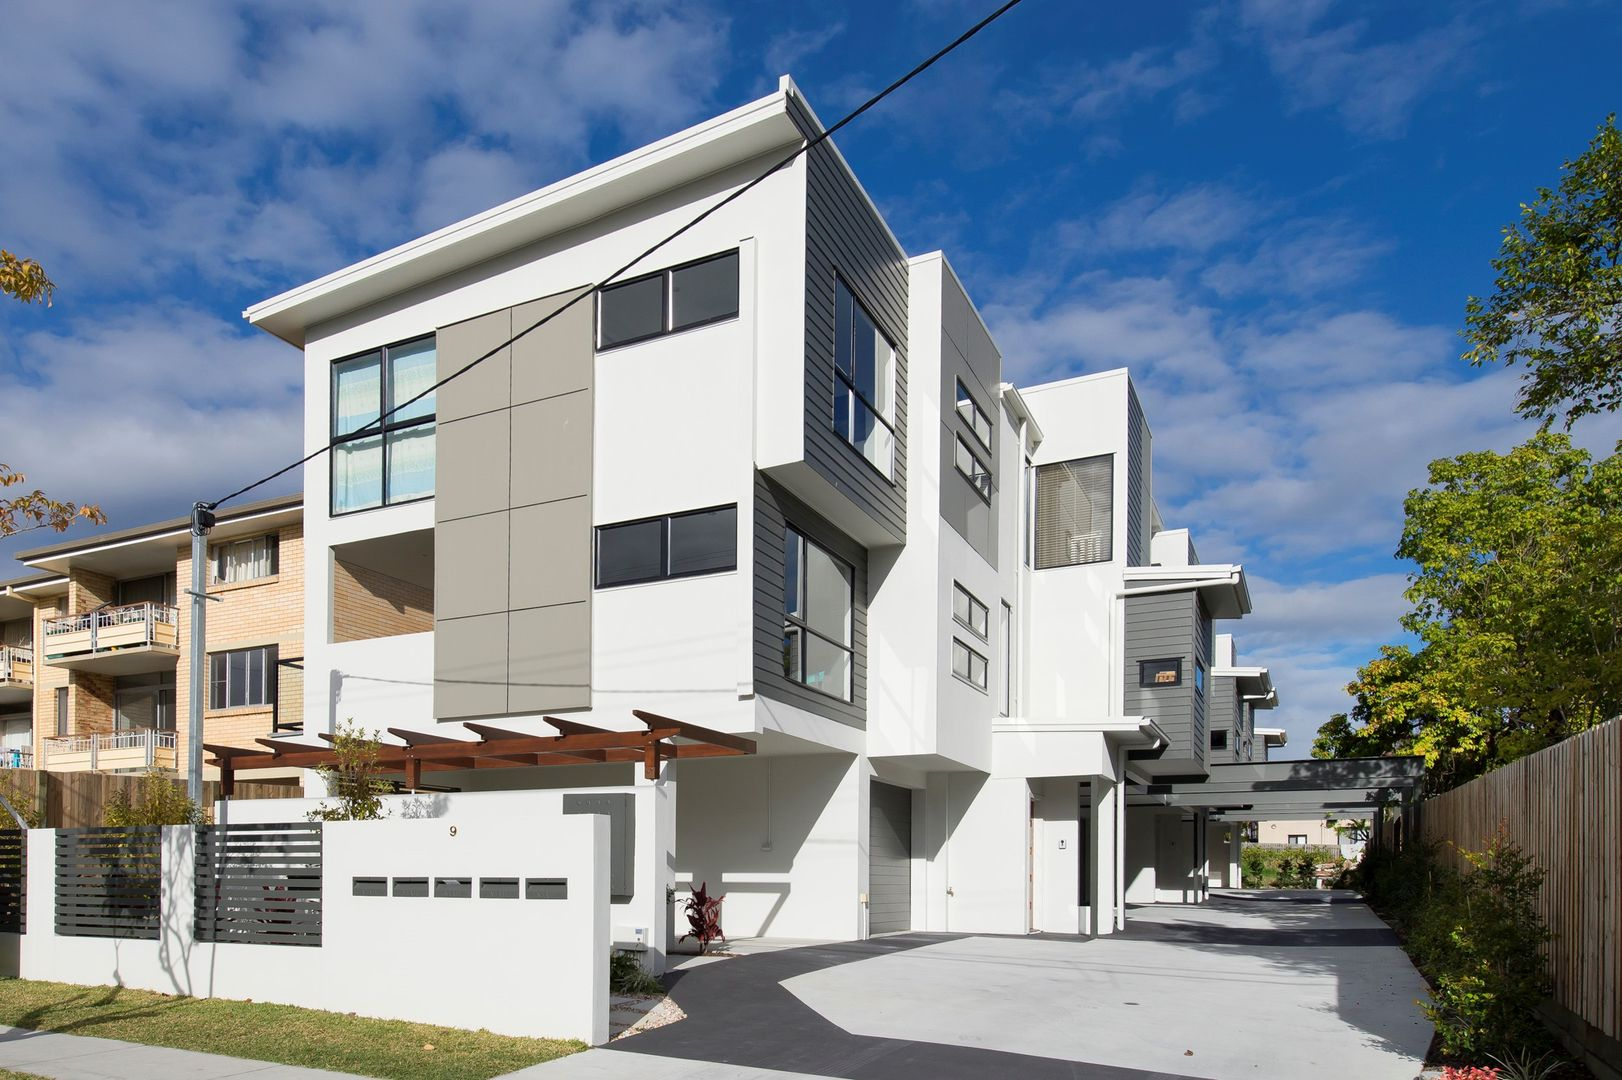 3/9 Haig Street, Coorparoo QLD 4151, Image 0